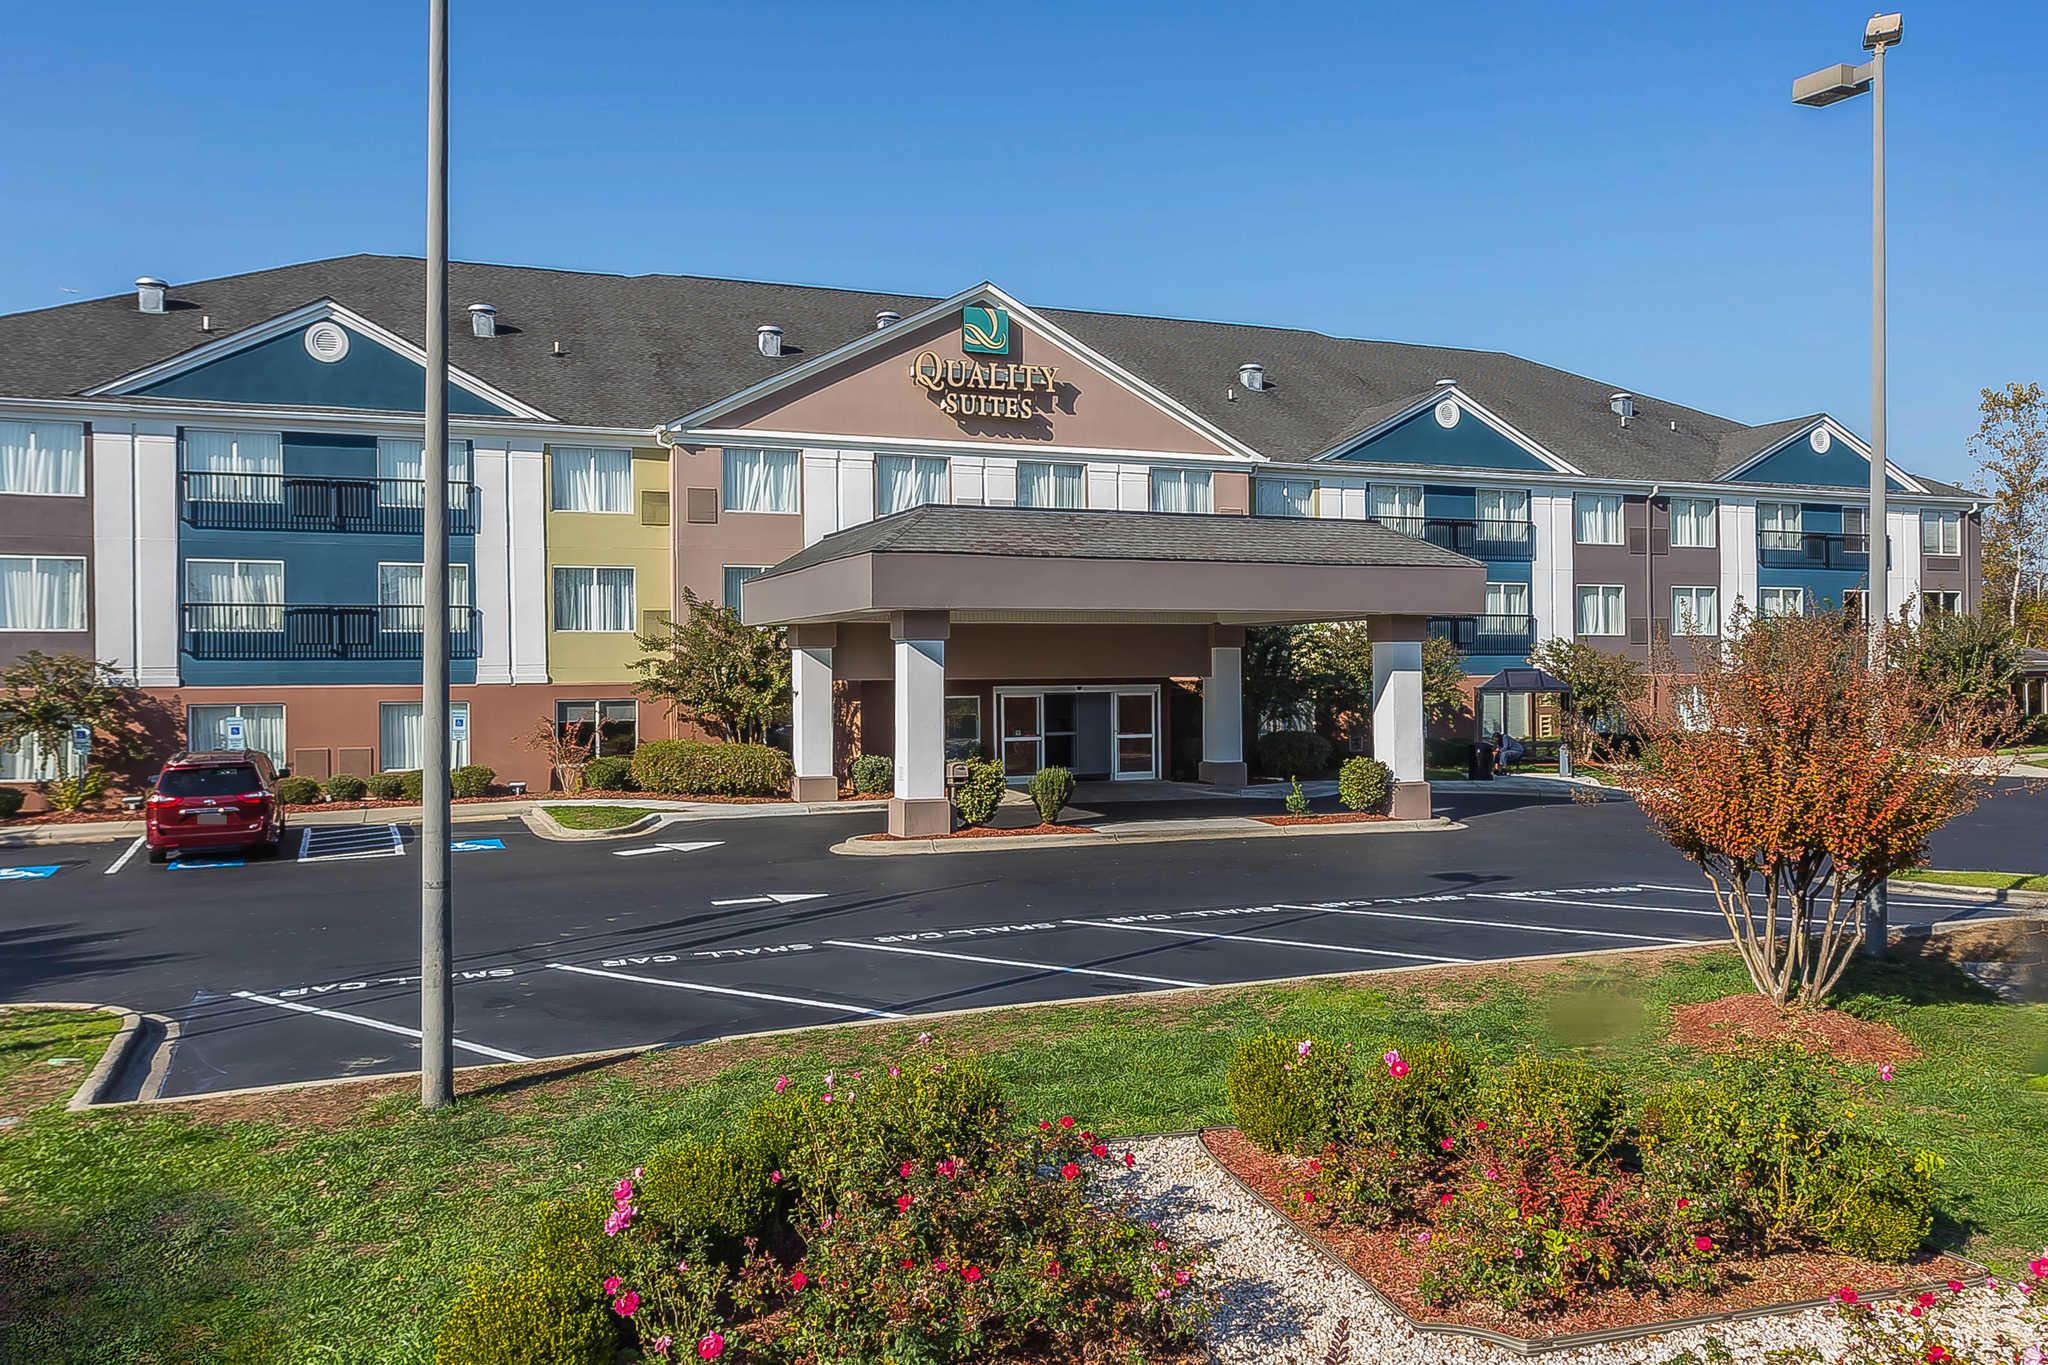 Quality suites pineville charlotte pineville north - Hilton garden inn charlotte pineville ...